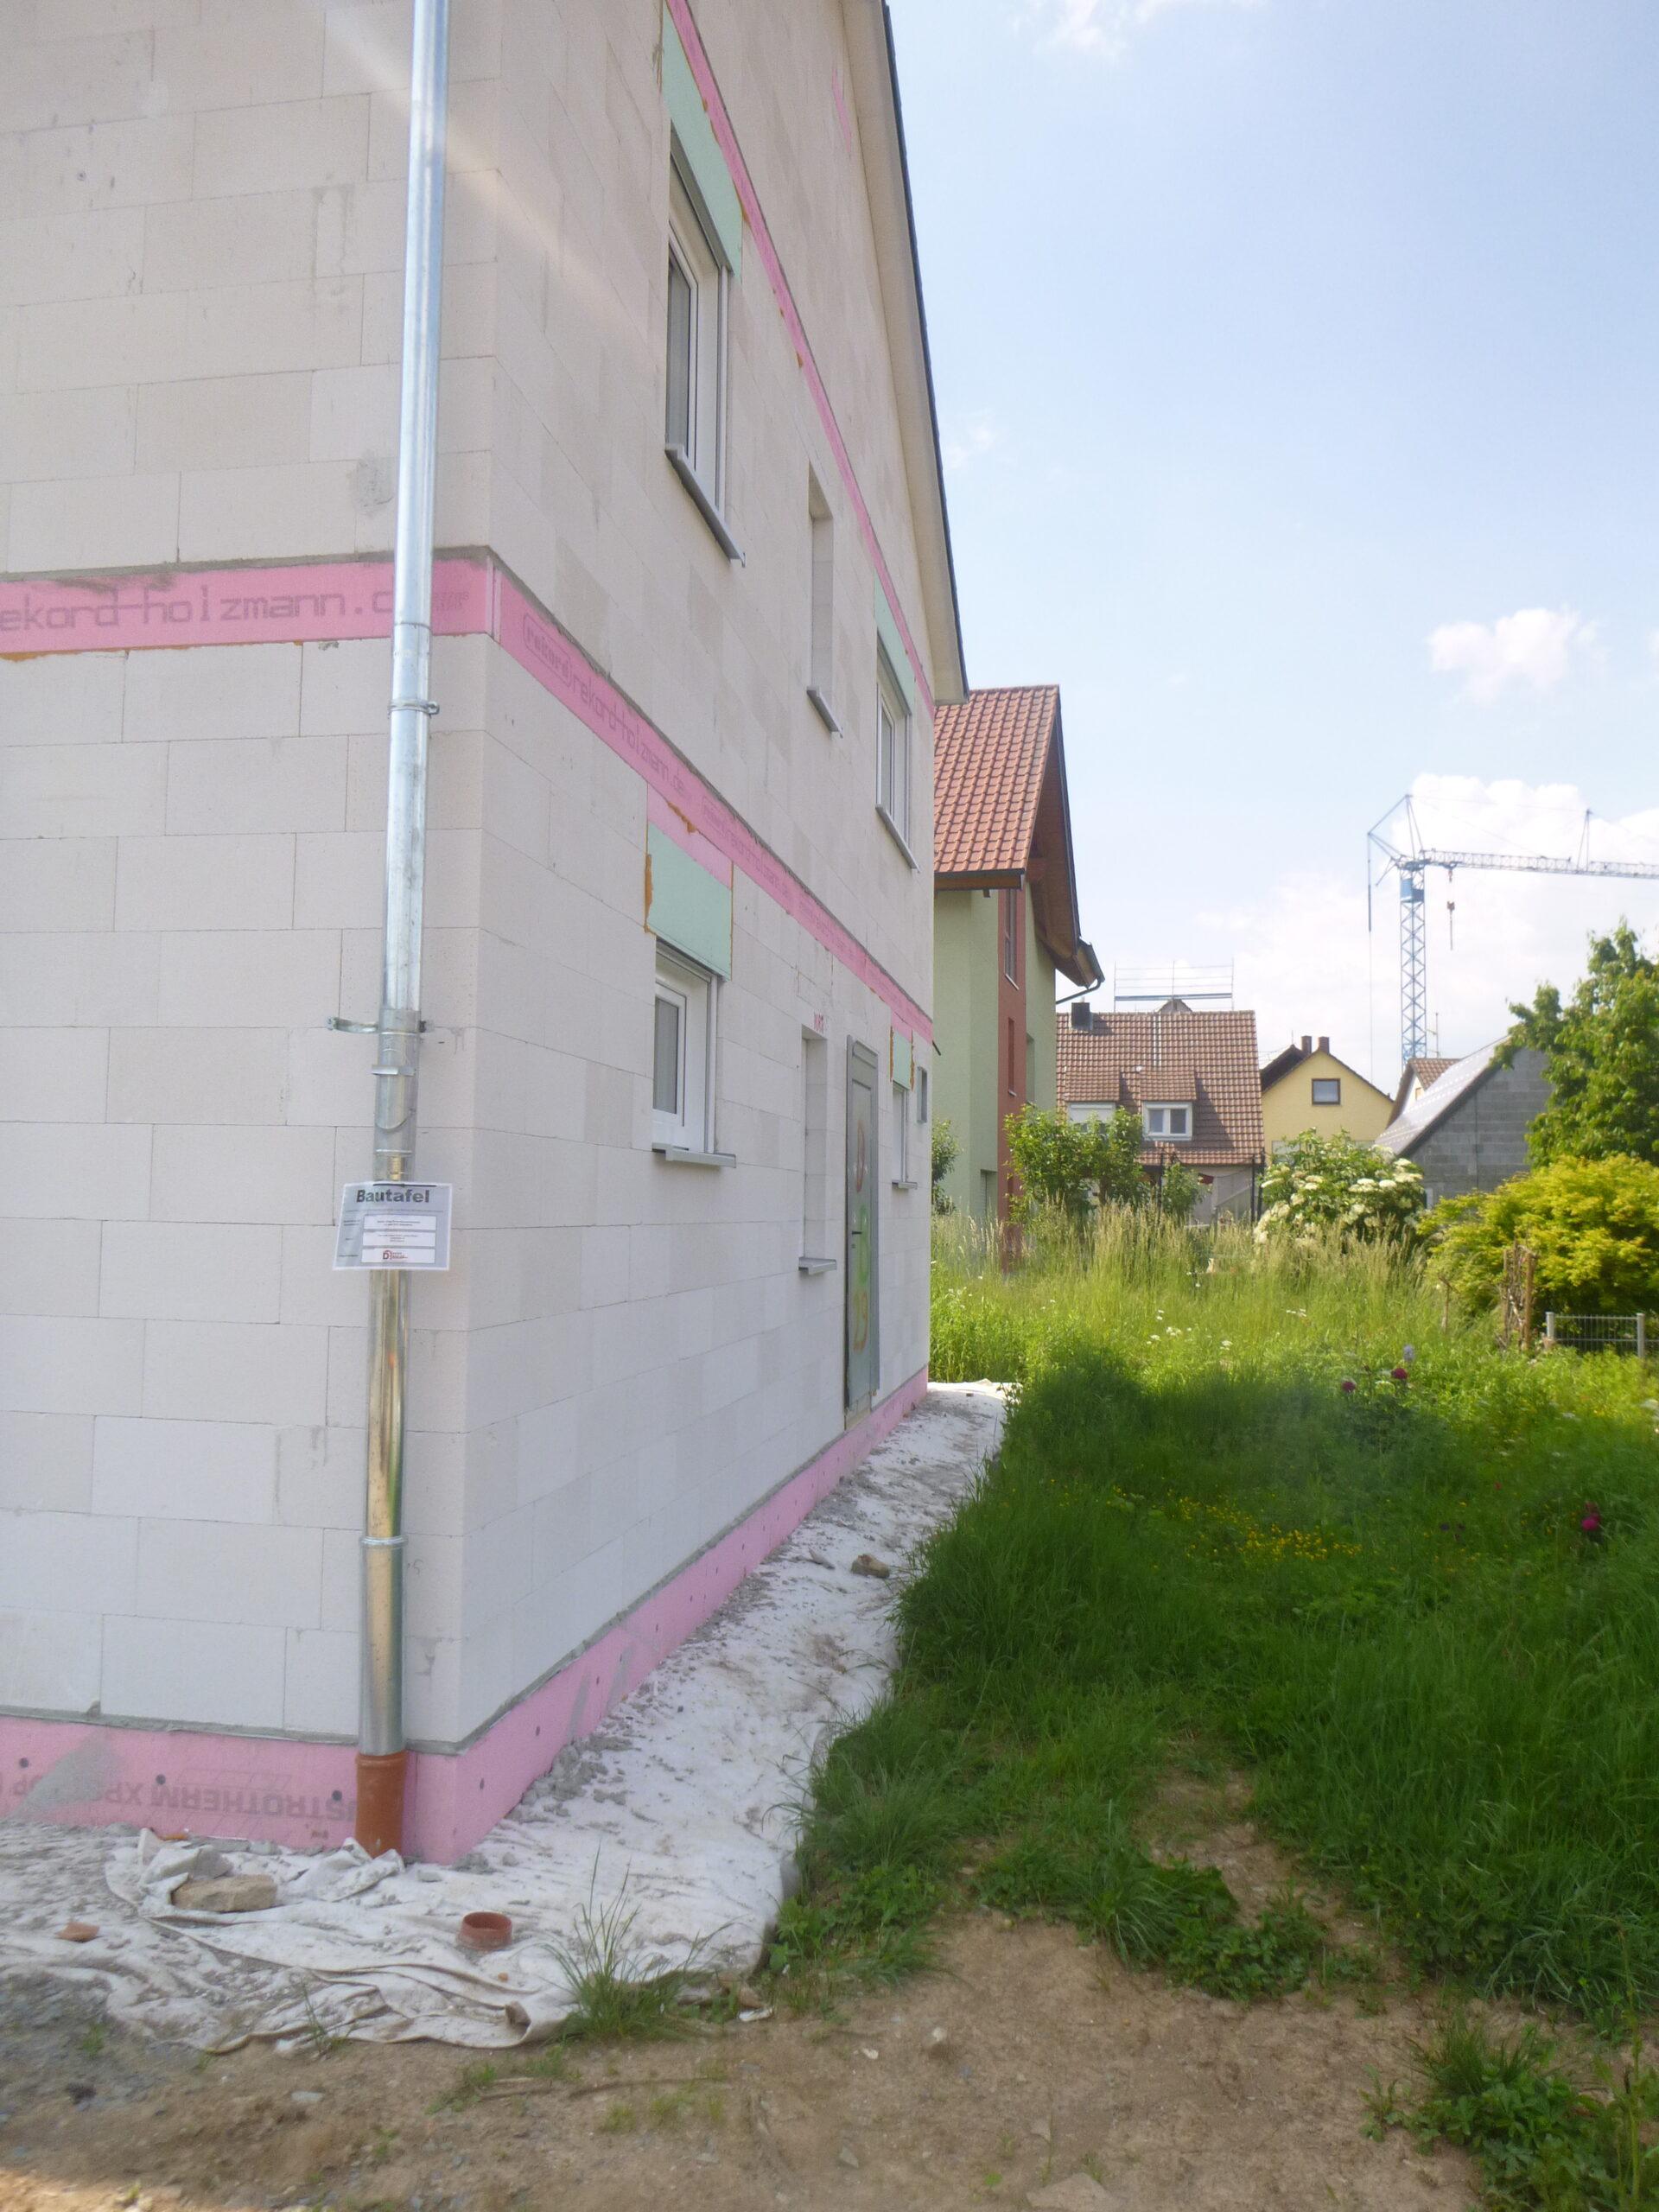 Rohbau - Graf-Rieneck-Strasse 20 - Erlabrunn (3)